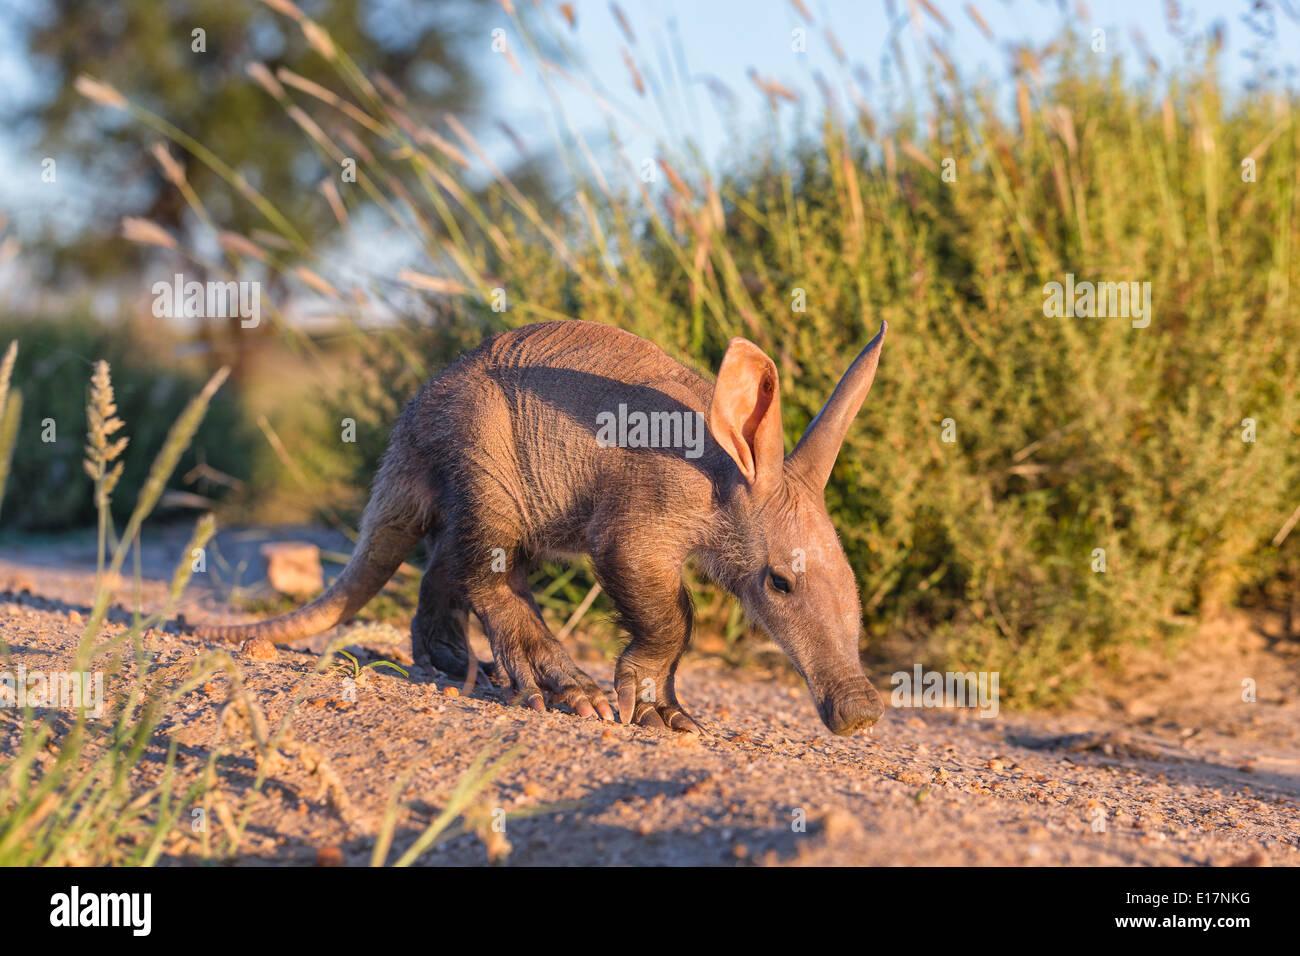 Young Aardvark(Orycteropus afer). Namibia Stockbild